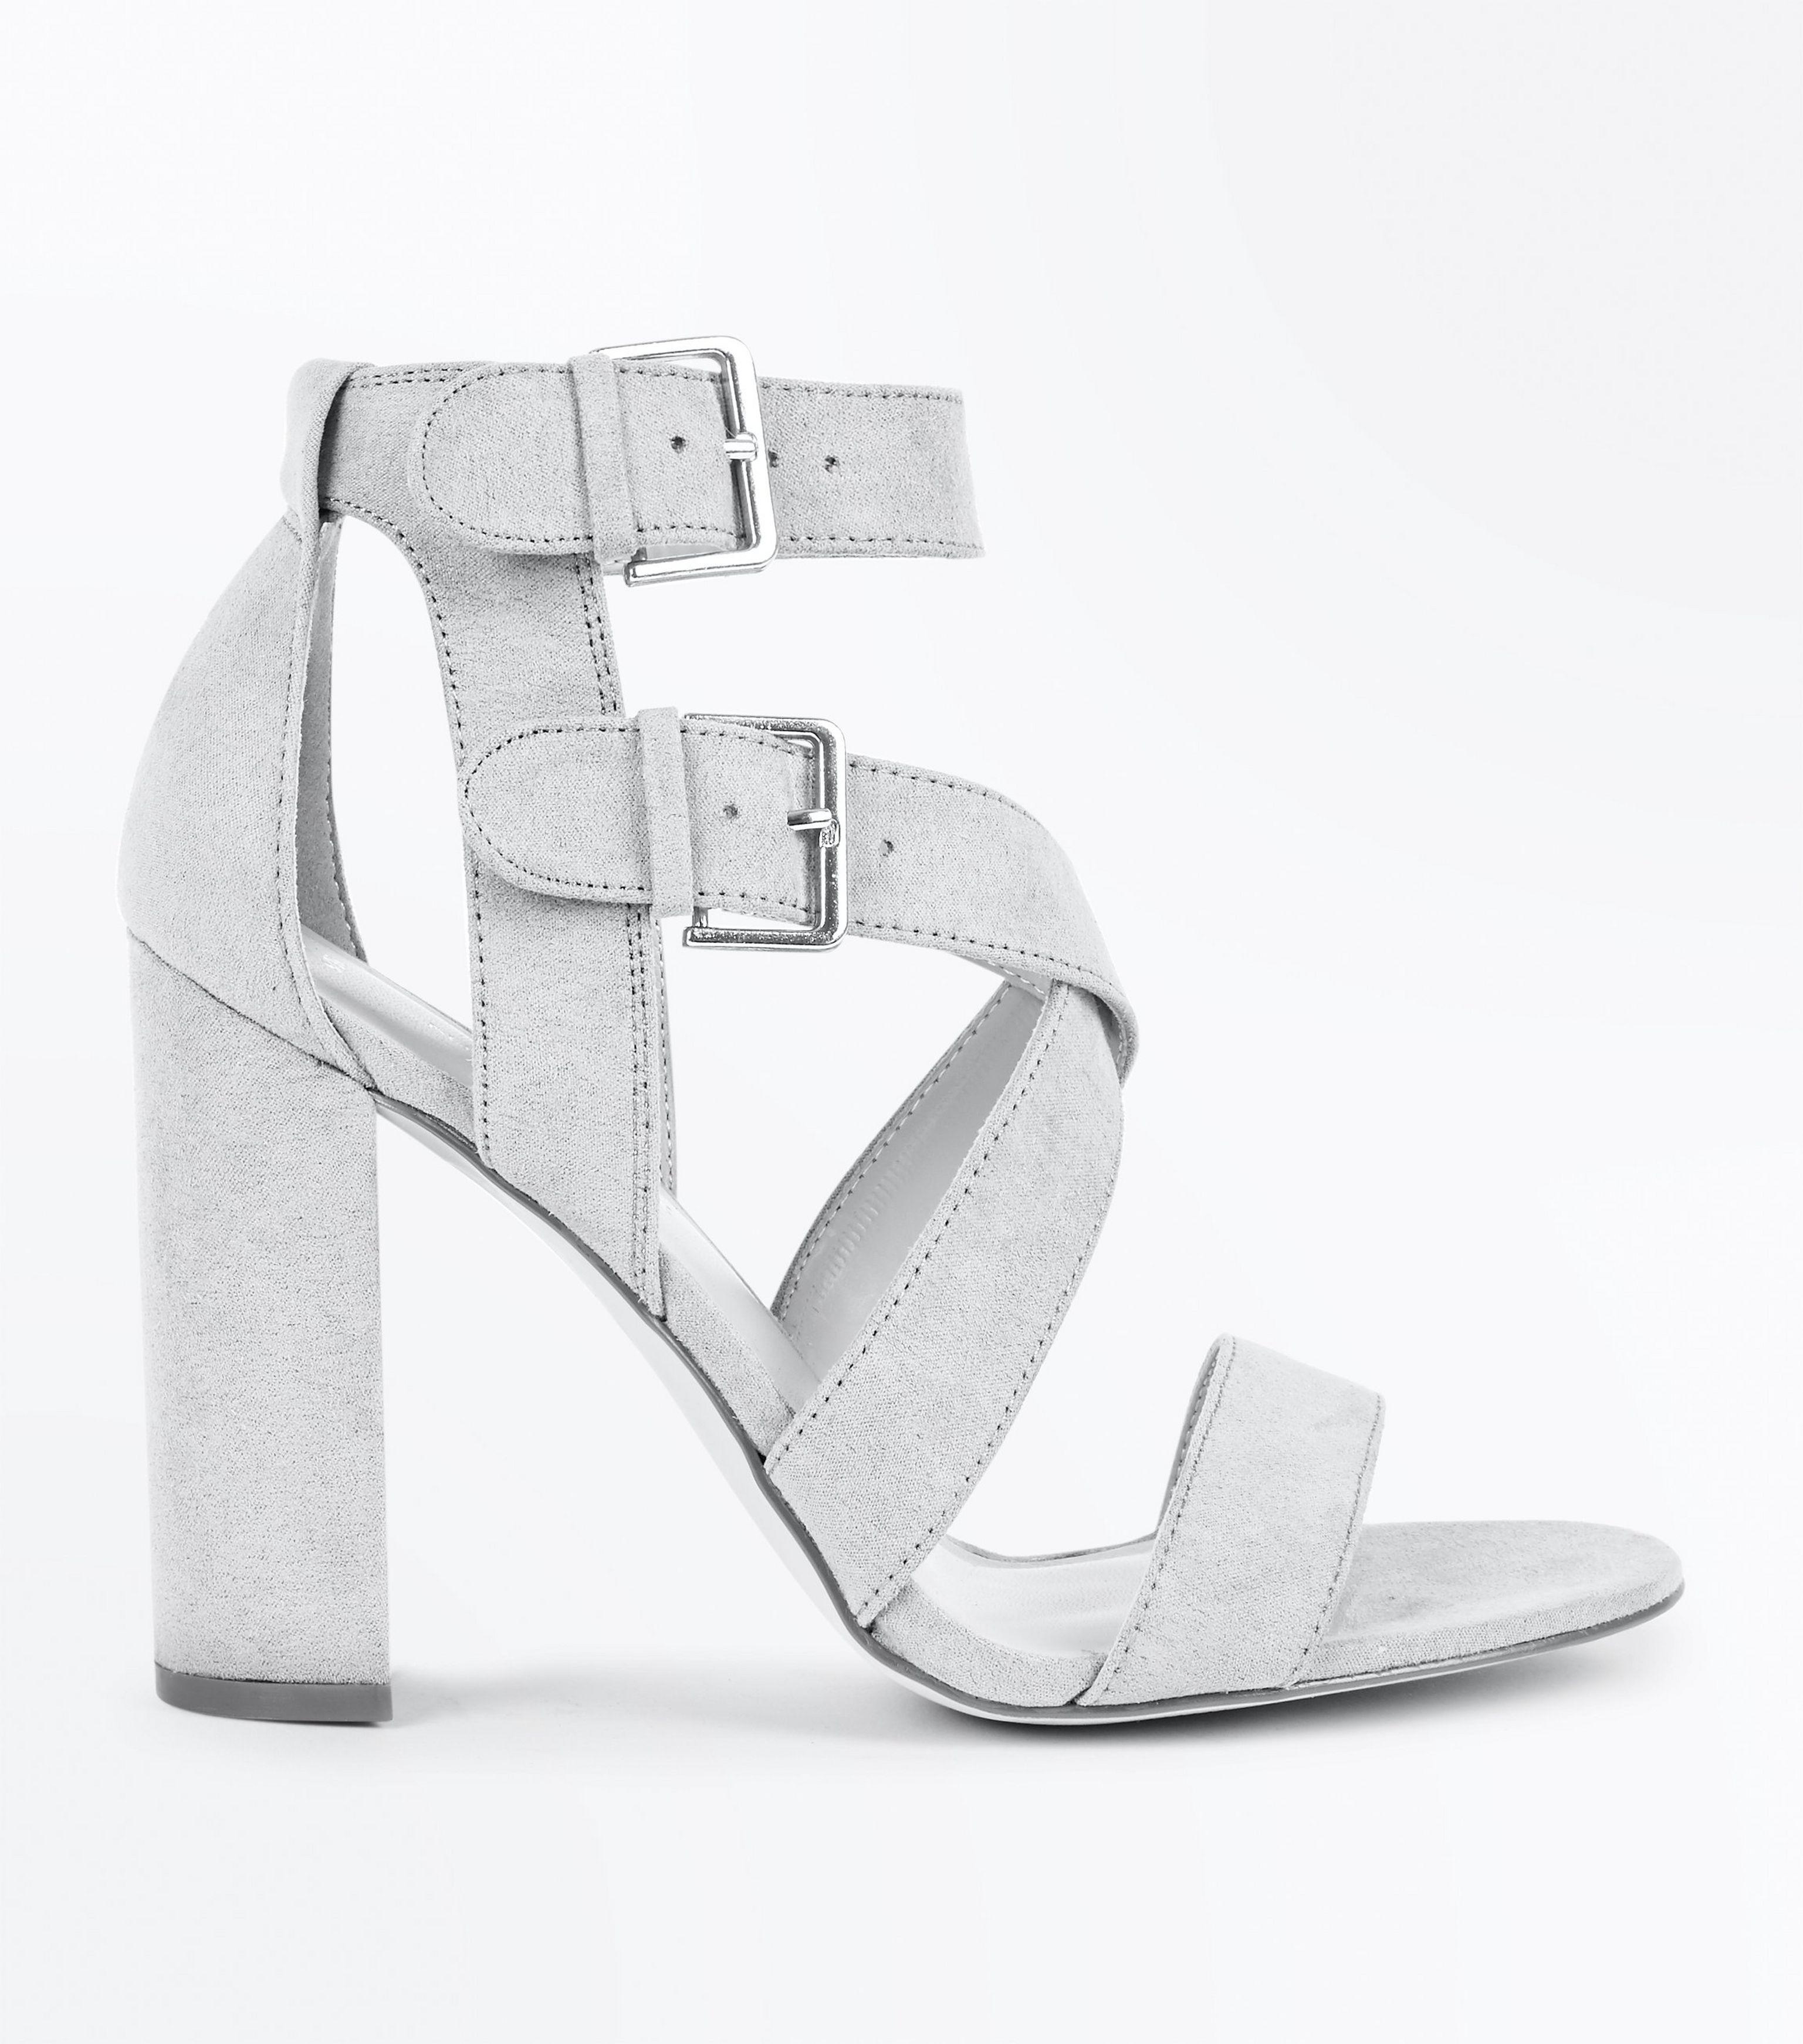 9ec91f22390 New Look Grey Suedette Strappy Double Buckle Block Heels in Gray - Lyst